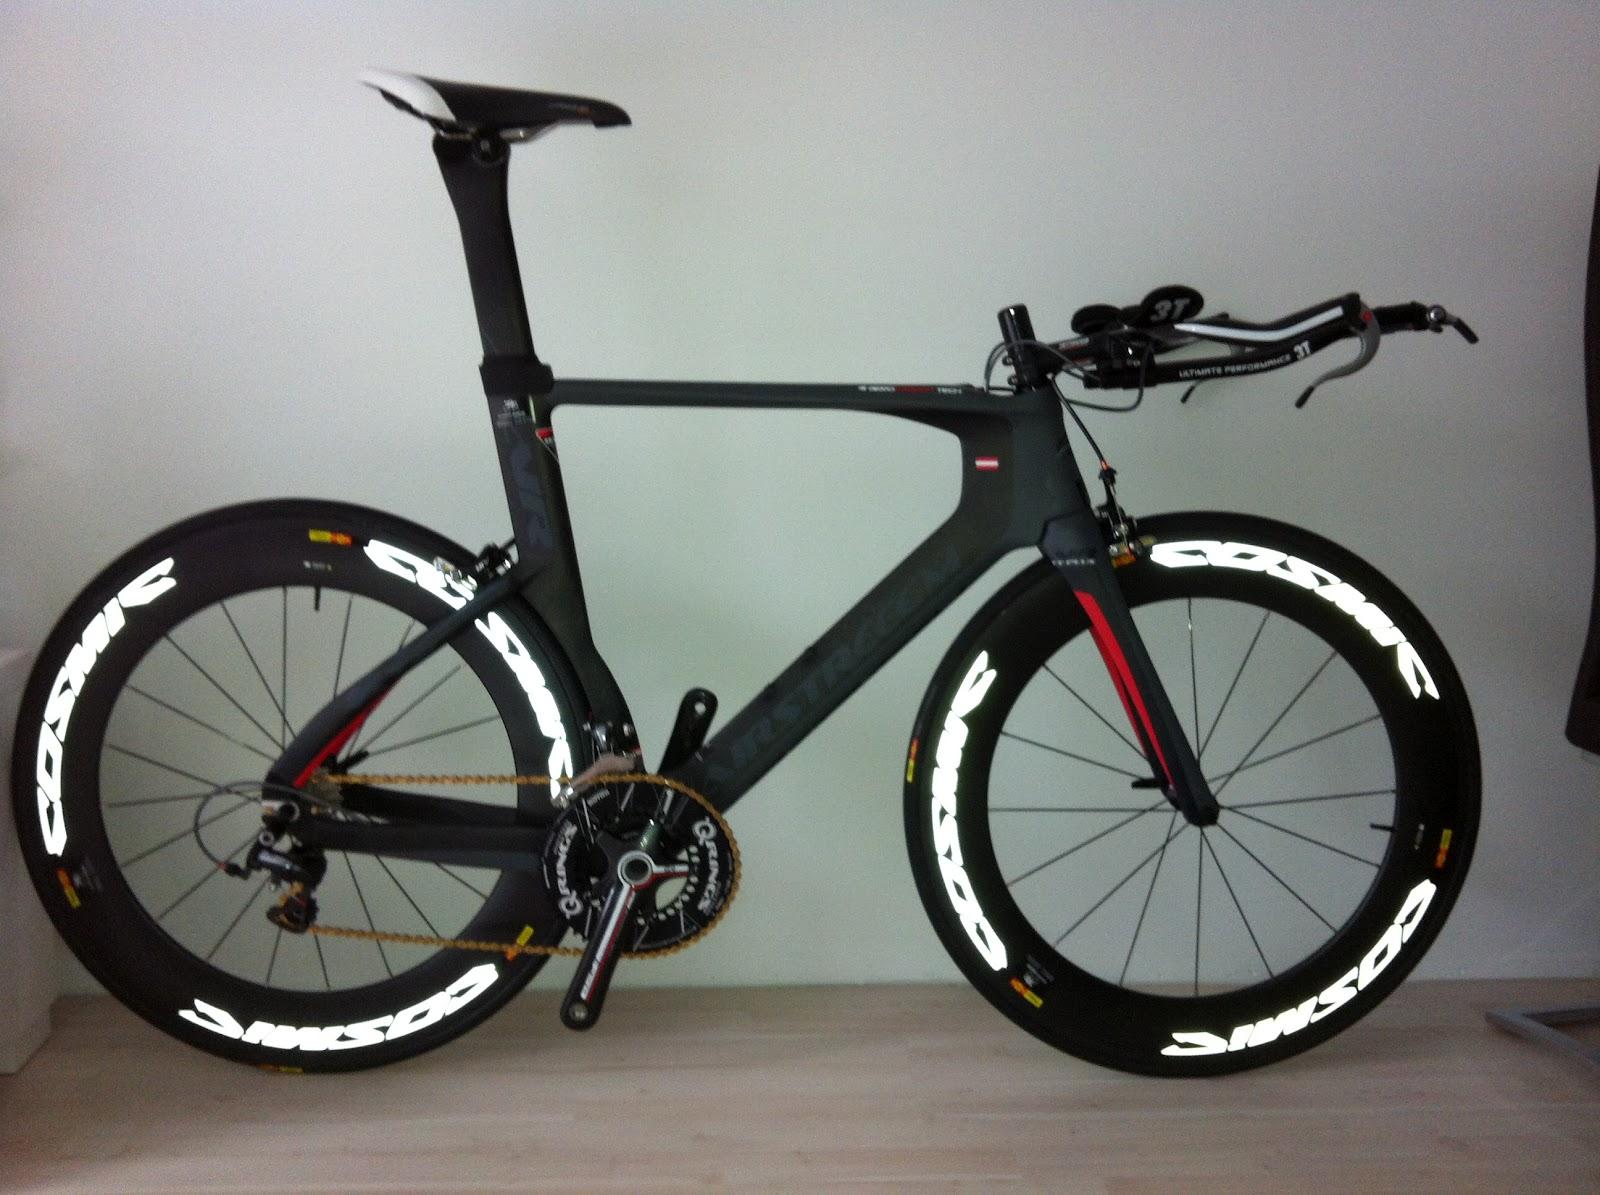 anf nger wie lenker des rennrads h her stellen shimano schaltung 600 seite 2 fahrrad. Black Bedroom Furniture Sets. Home Design Ideas